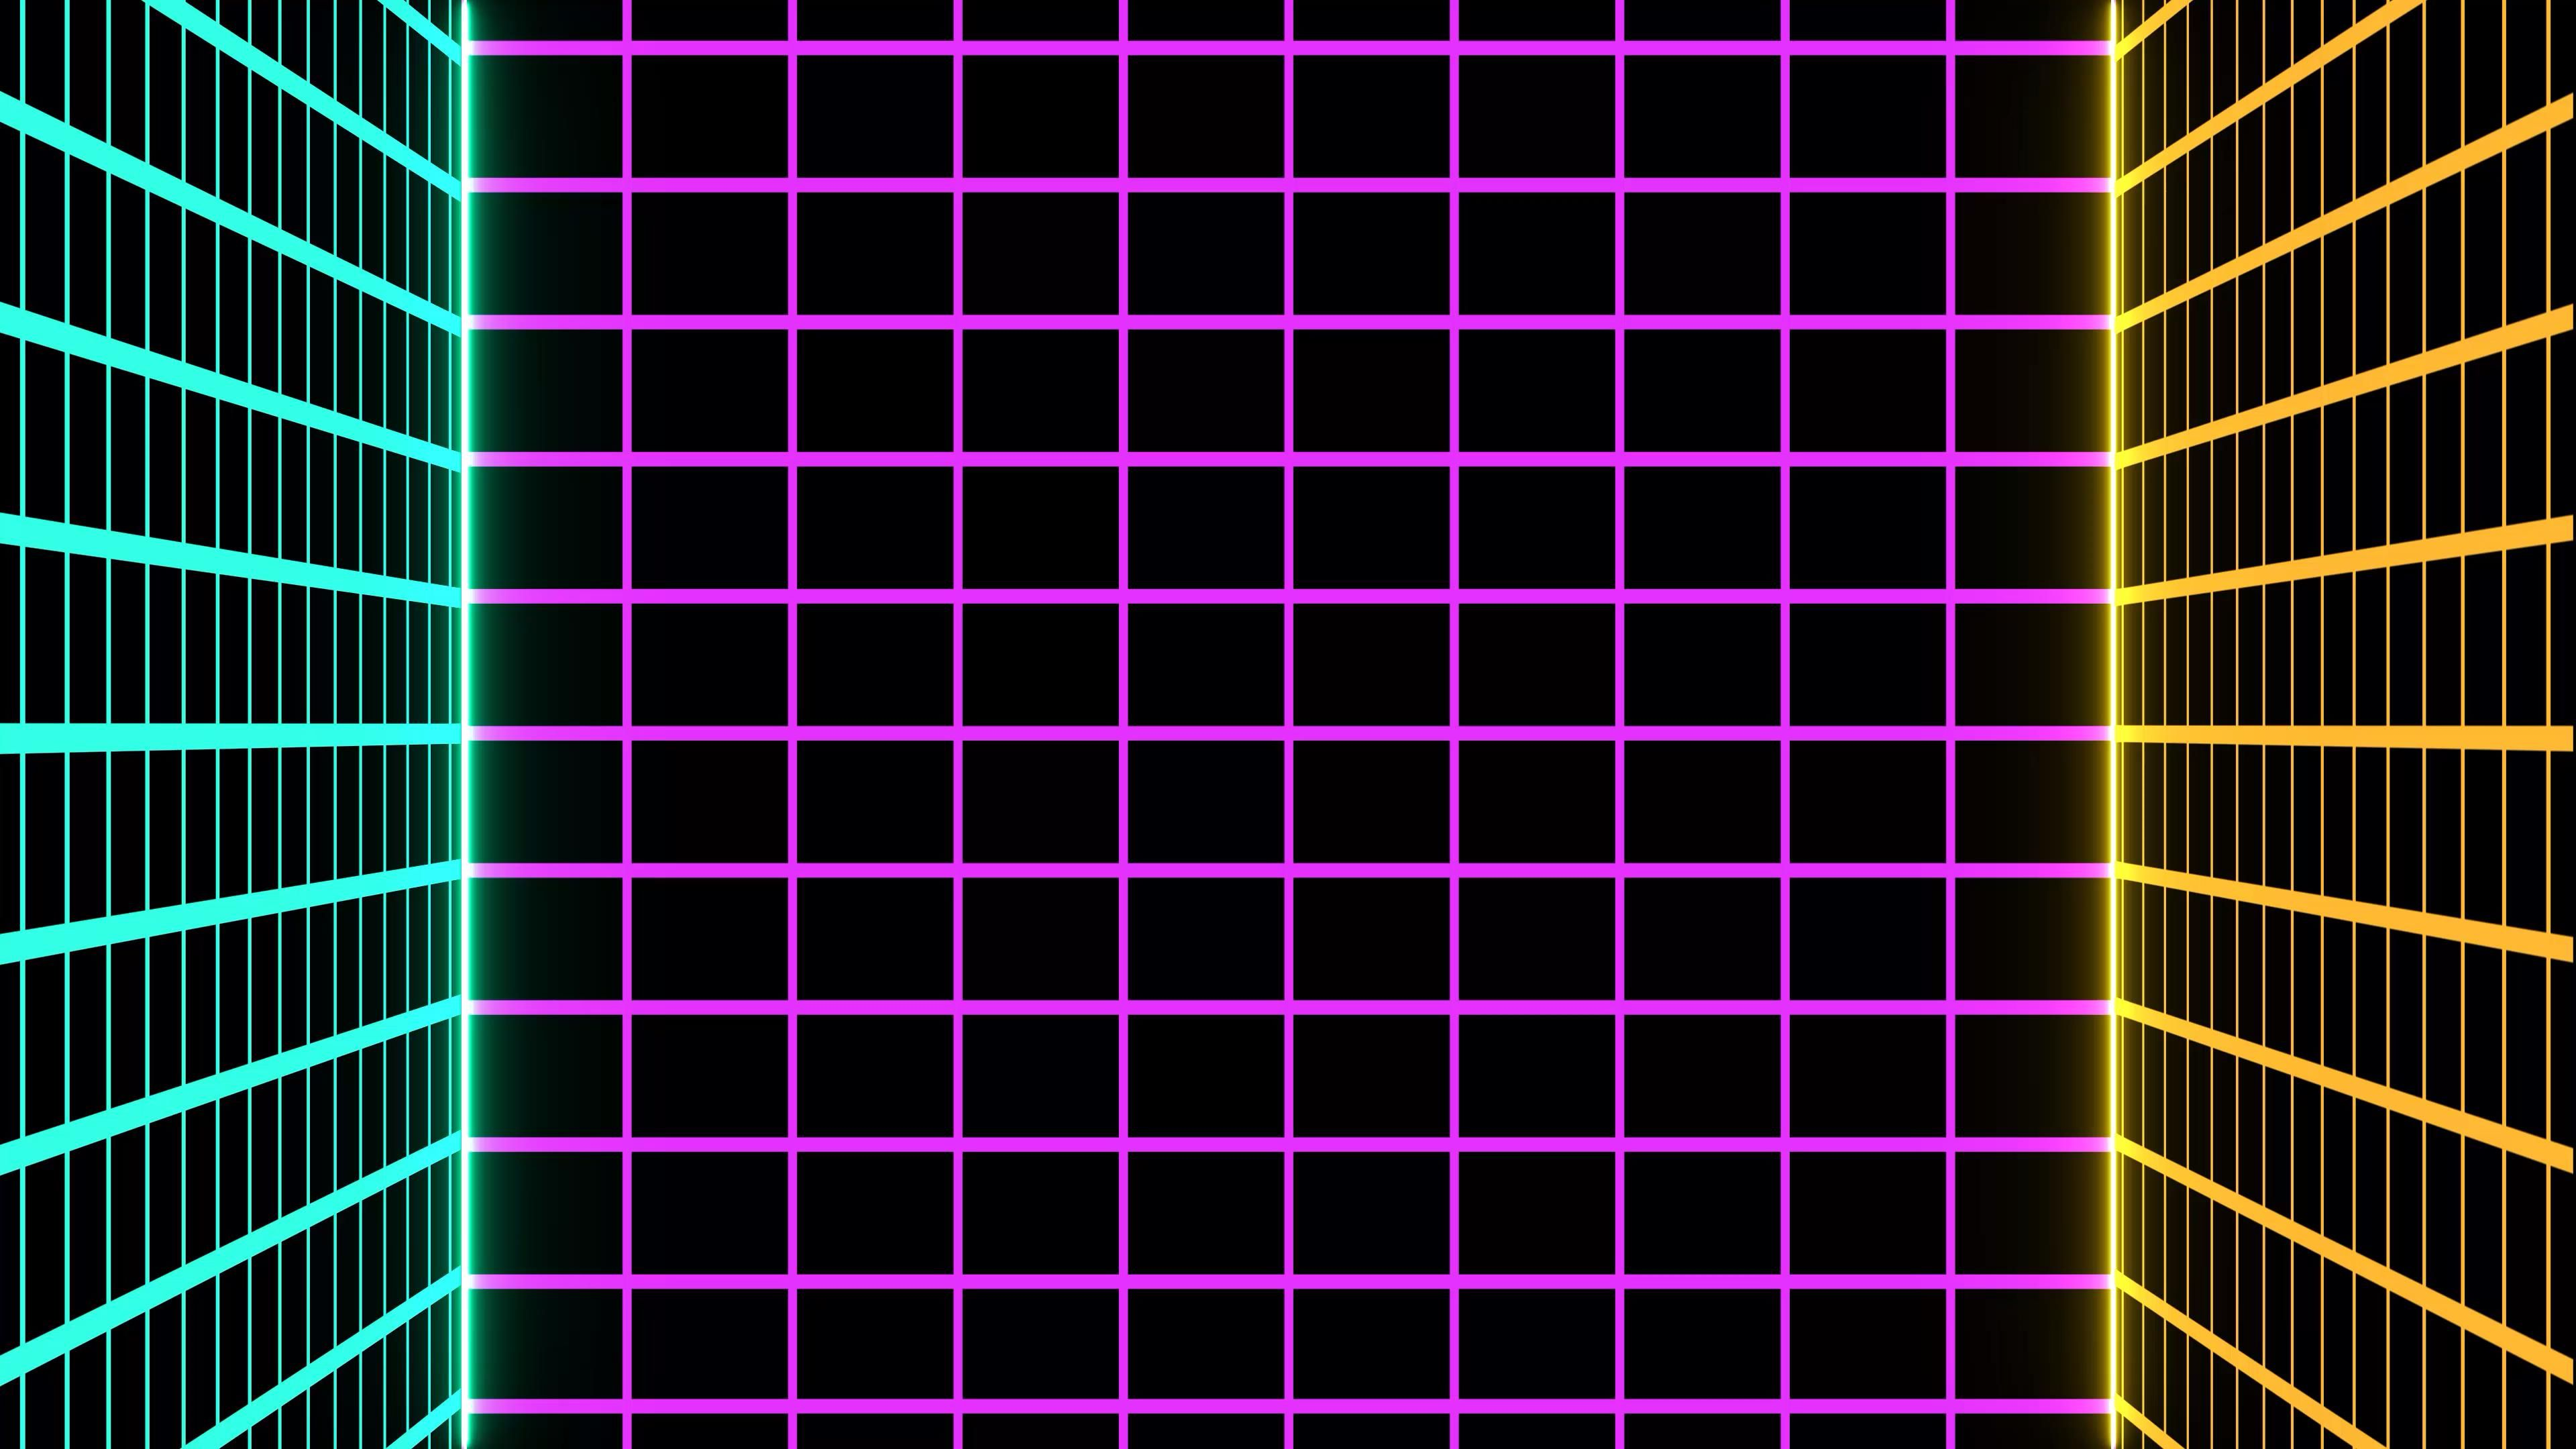 Free Motion Graphic Virtual Background 👾 Retro Neon Grid 80s Cyberpunk VJ Loop